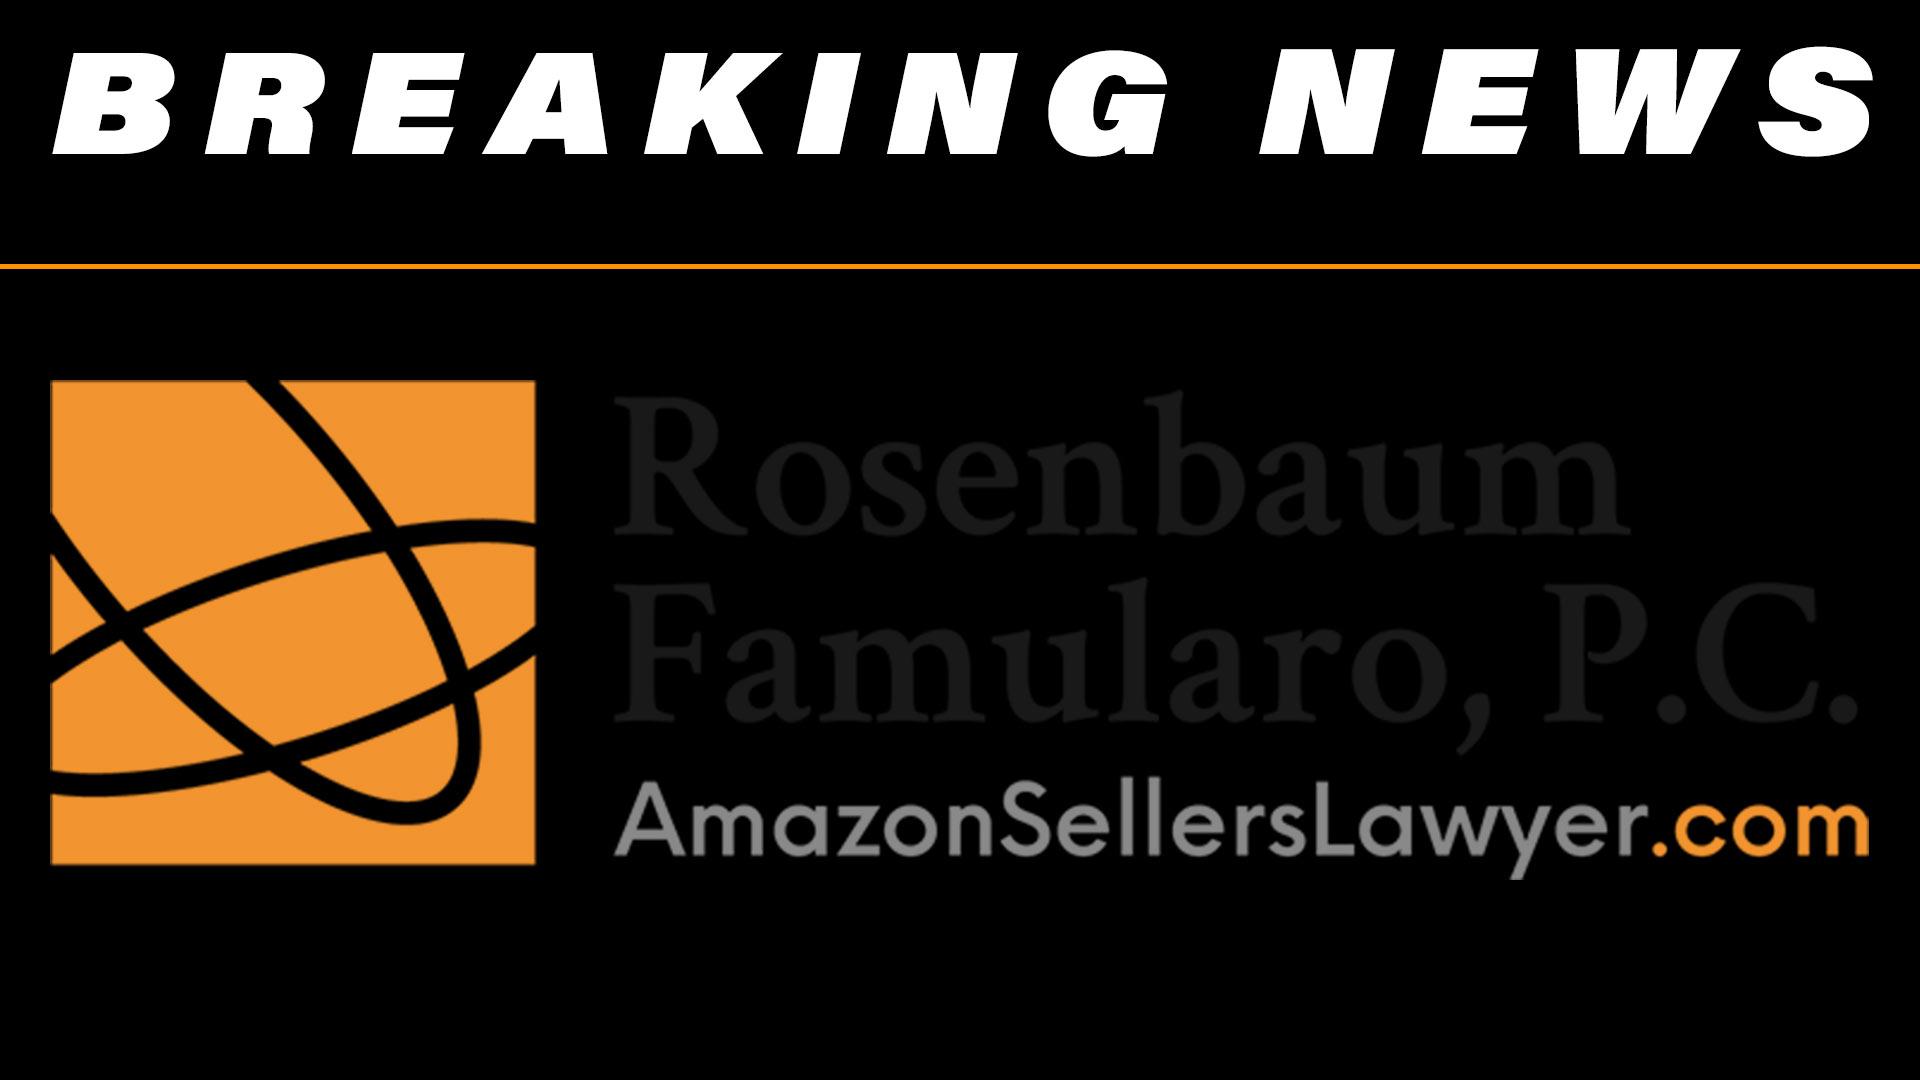 Amazon News Stories